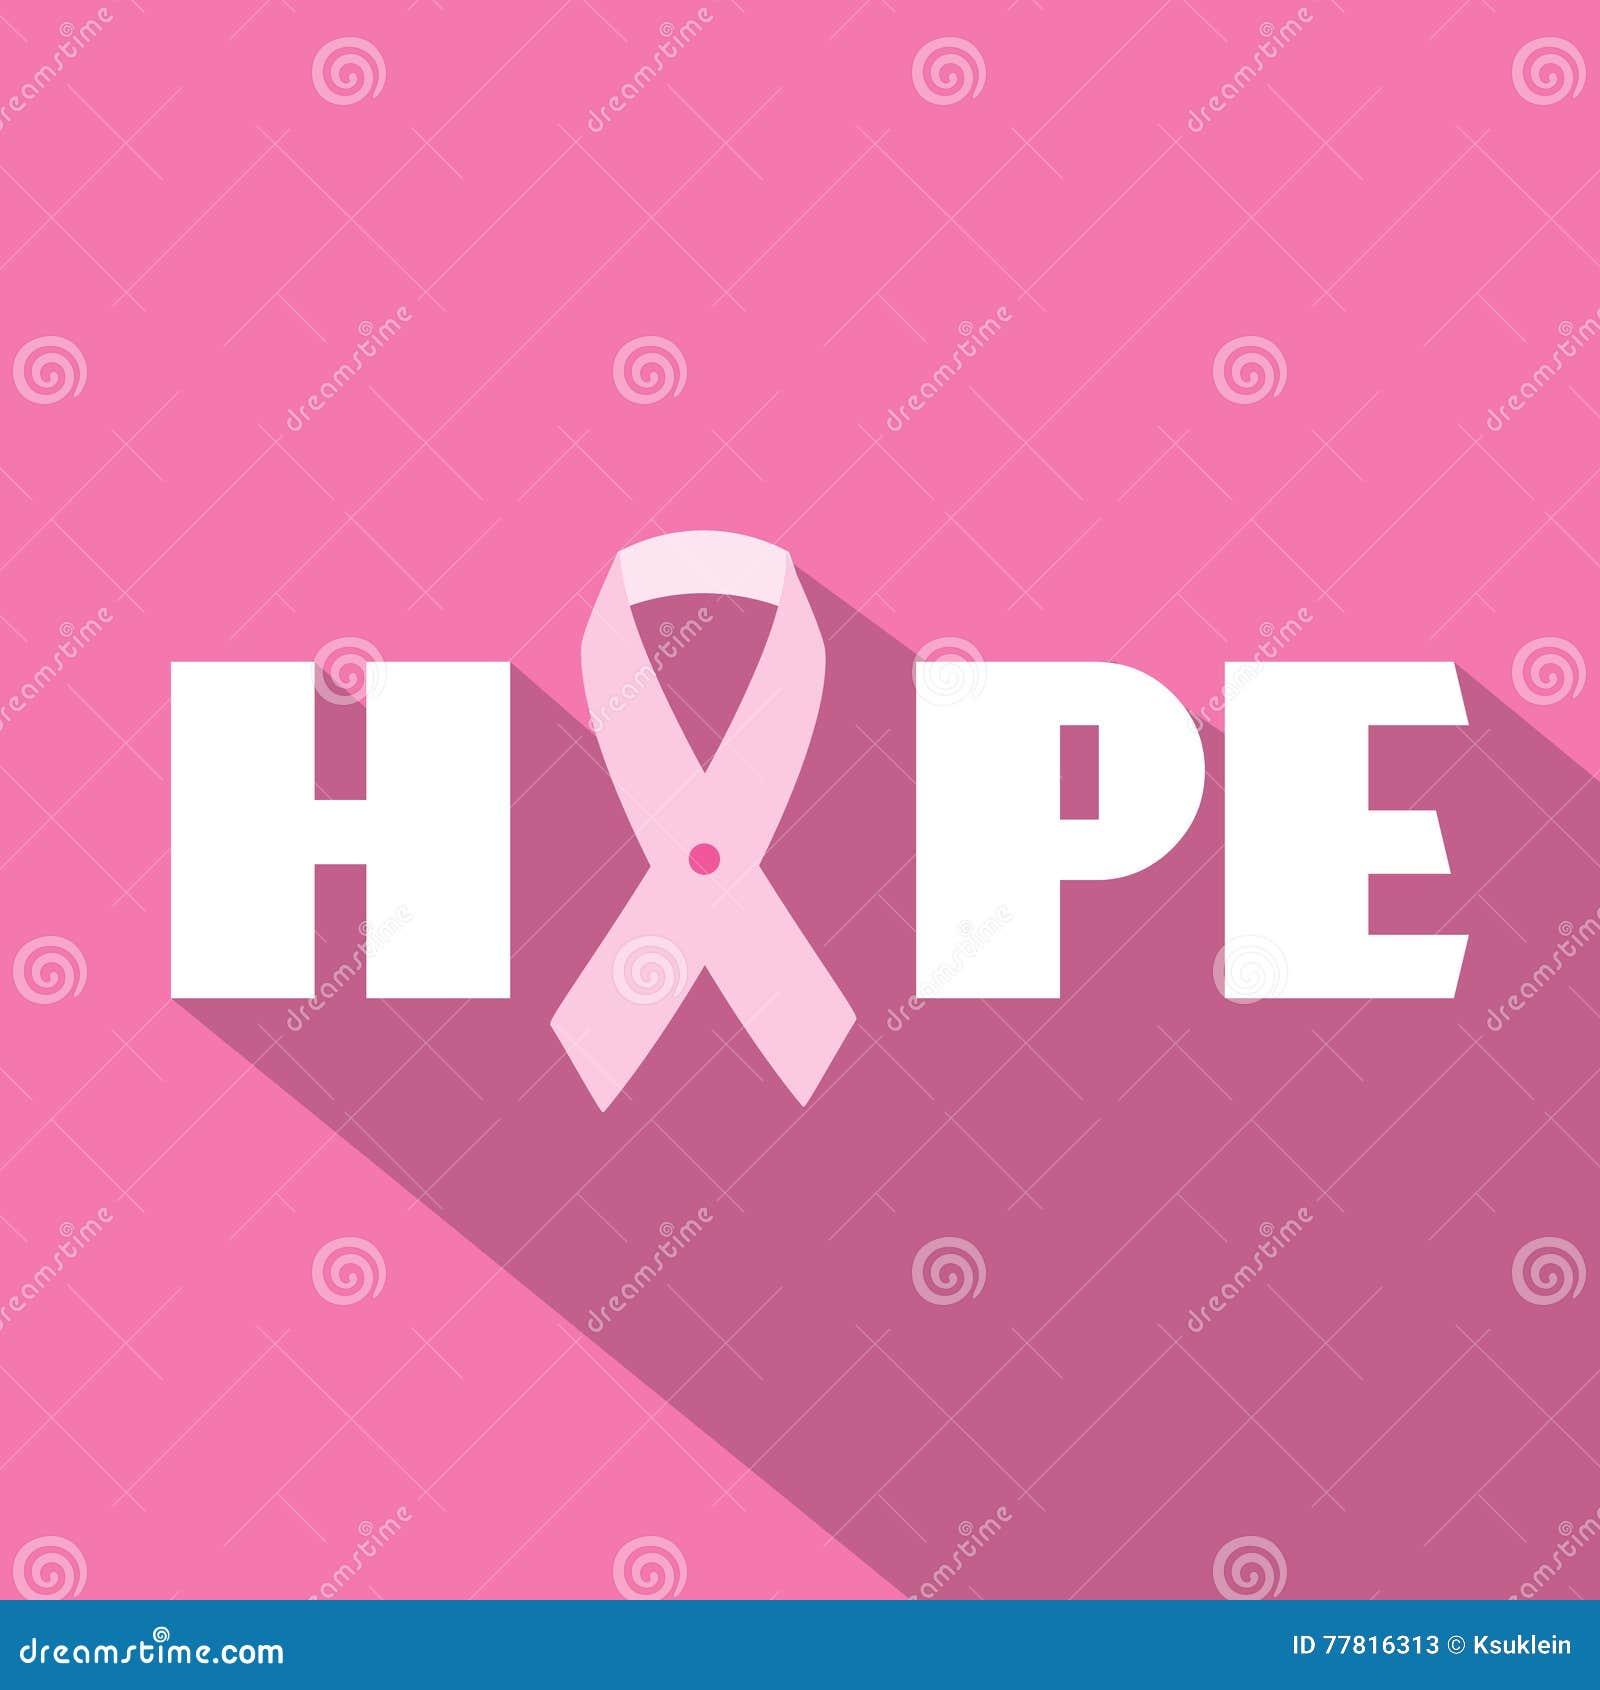 Breast cancer awareness month illustration with hope slogan and pink breast cancer awareness month illustration with hope slogan and pink ribbon symbol biocorpaavc Choice Image